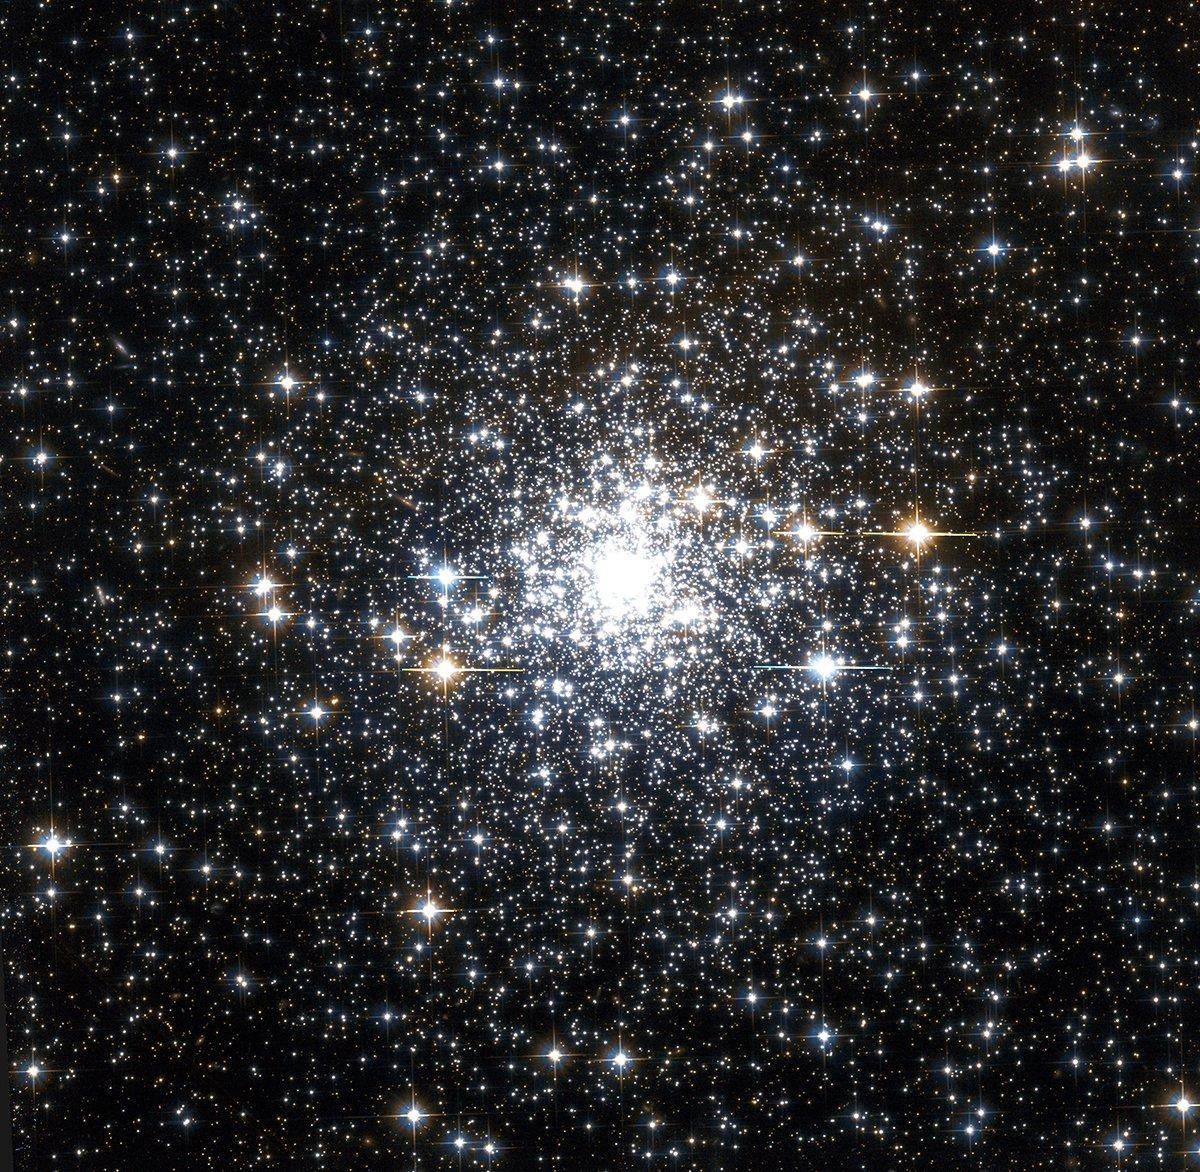 Chandra Observatory on Twitter: